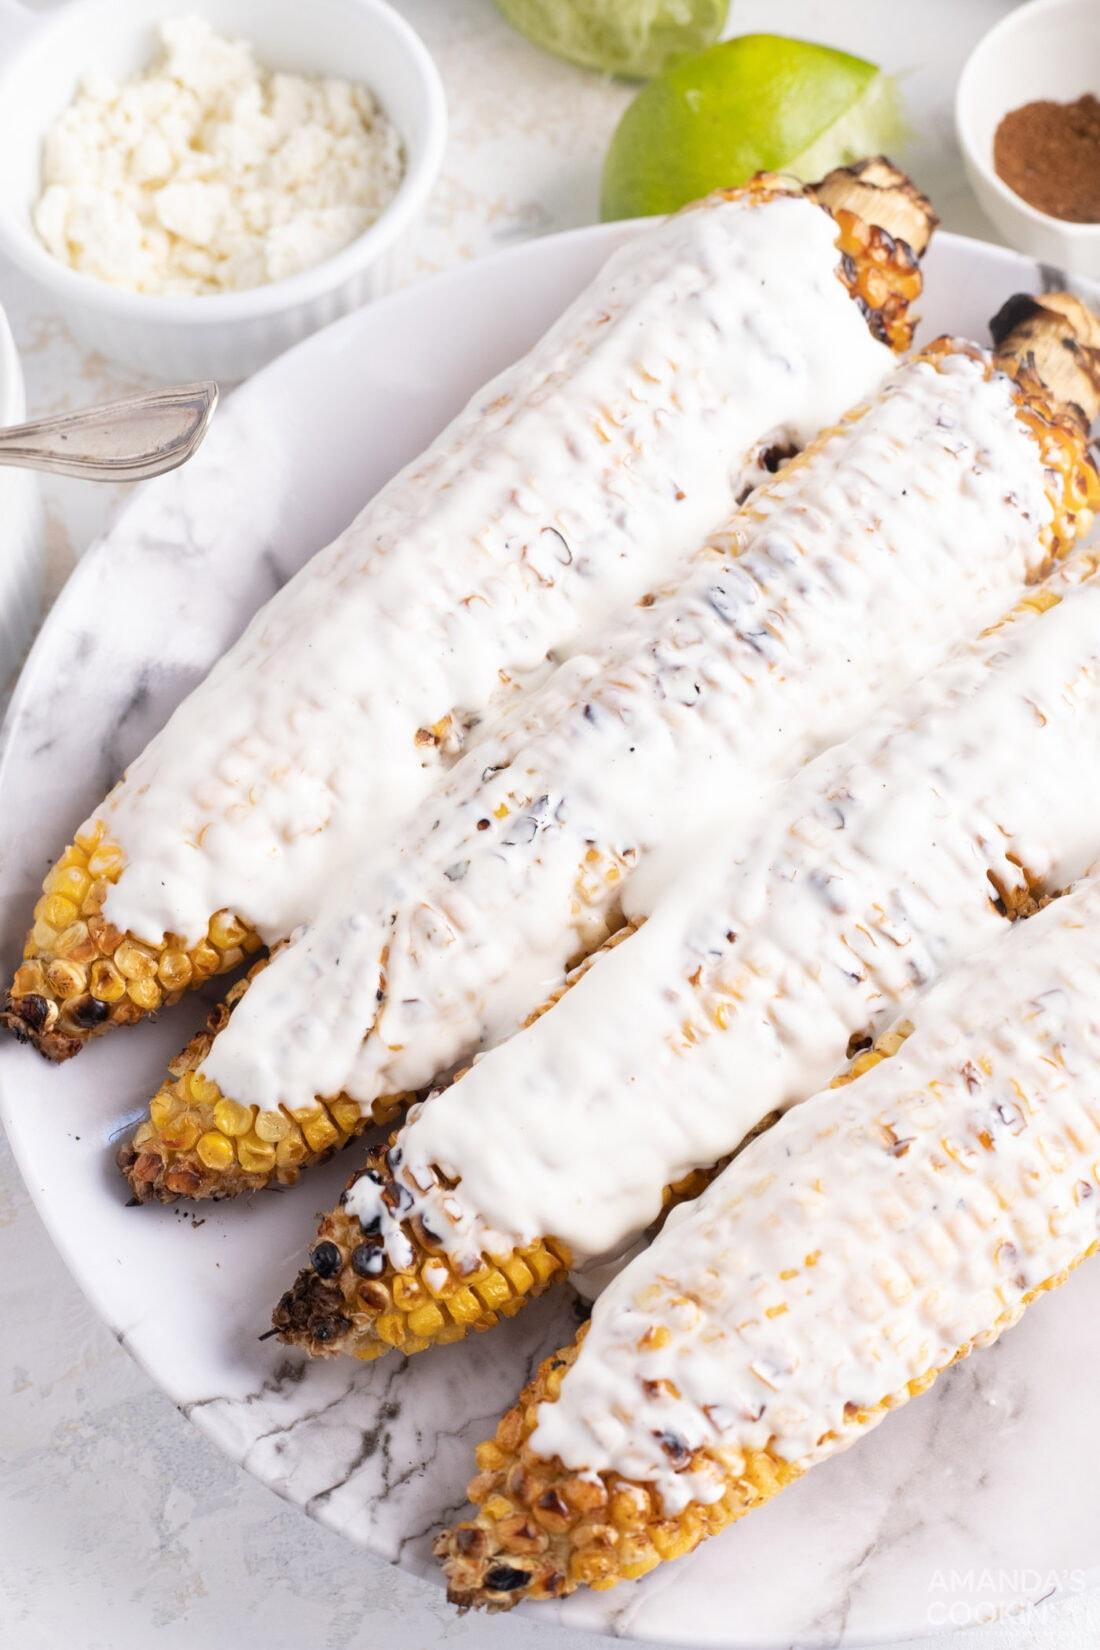 mayo on corn cobs